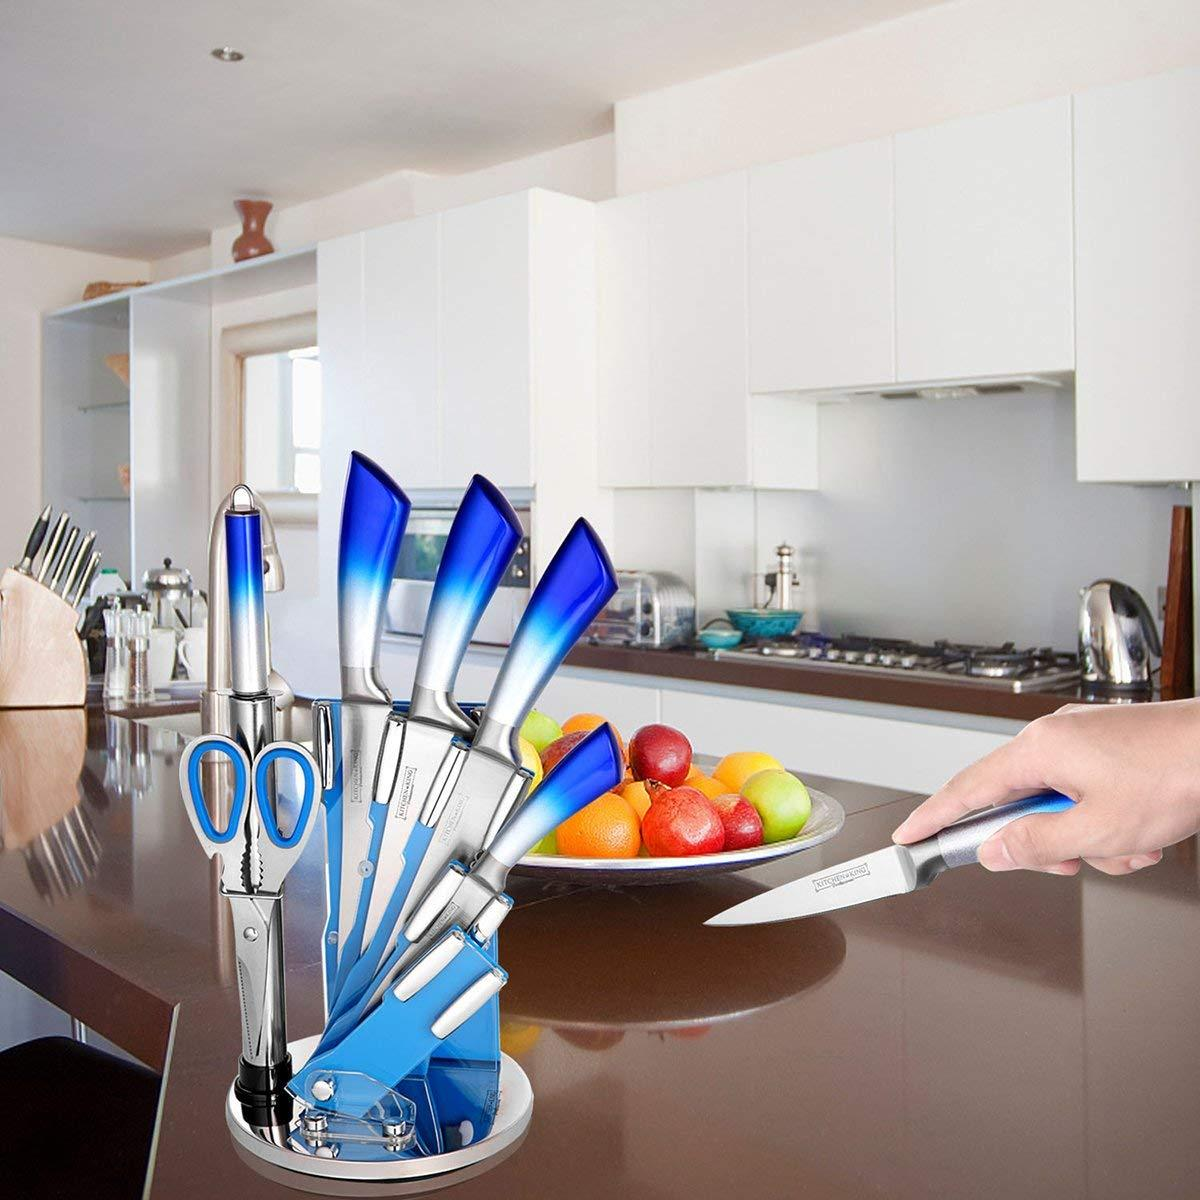 8-Piece-Stainless-Steel-Kitchen-Cutlery-Knife-Set-Lt-00001